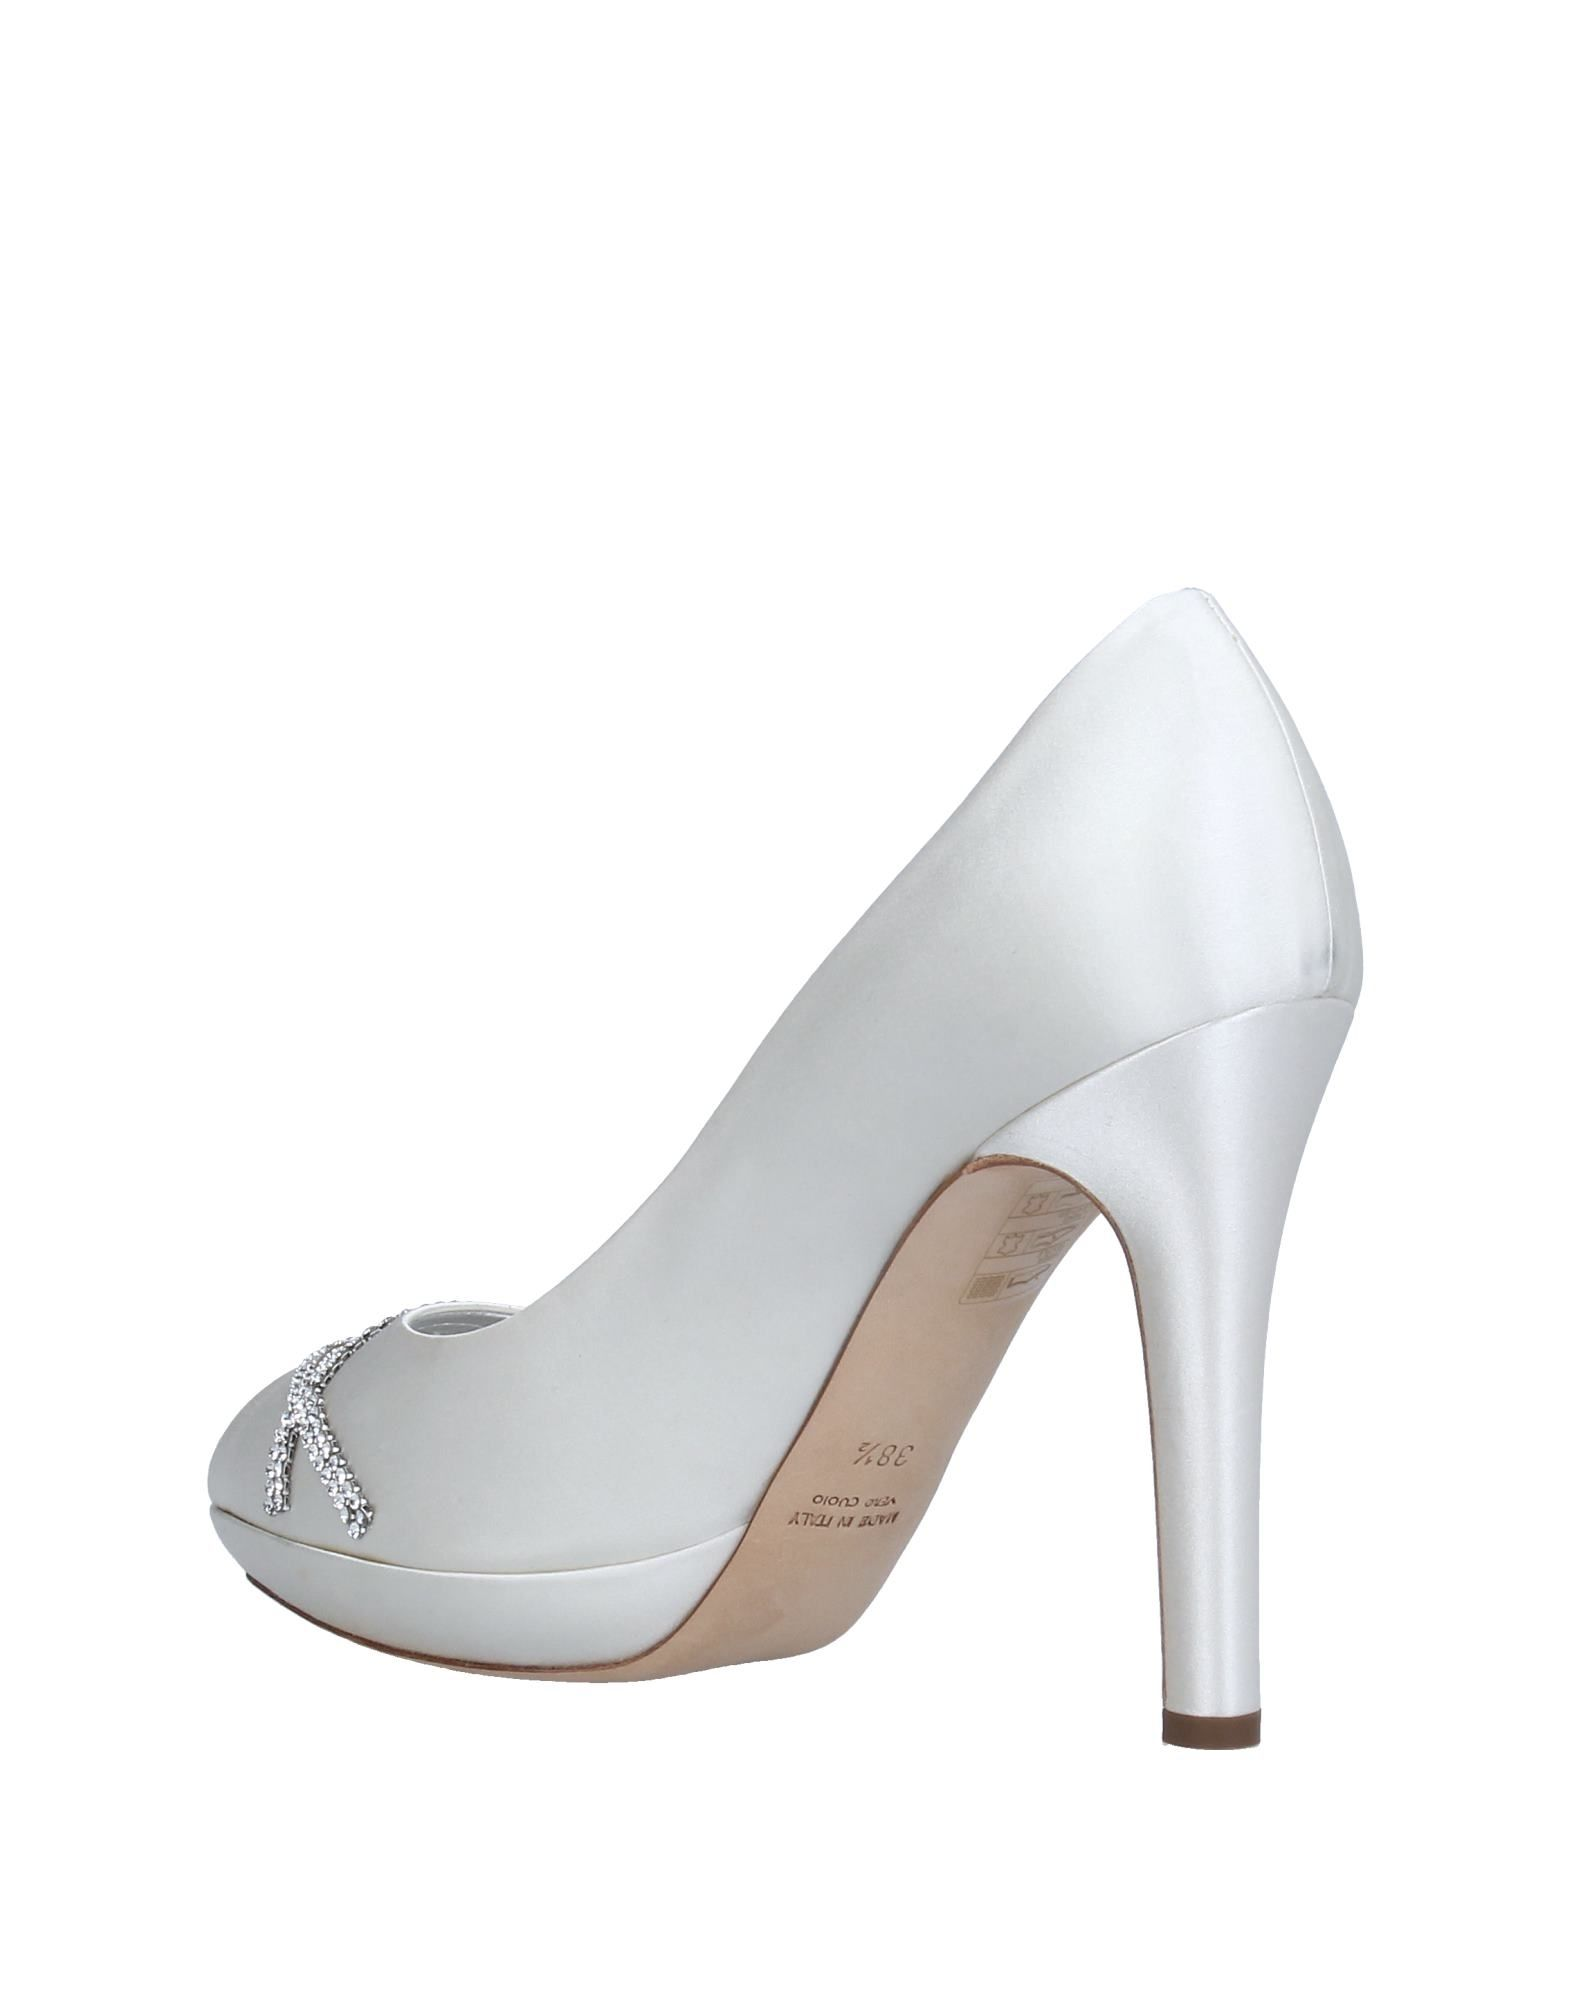 Stilvolle billige Schuhe Schuhe Schuhe Martin Clay Pumps Damen  11262754AP 83bab7